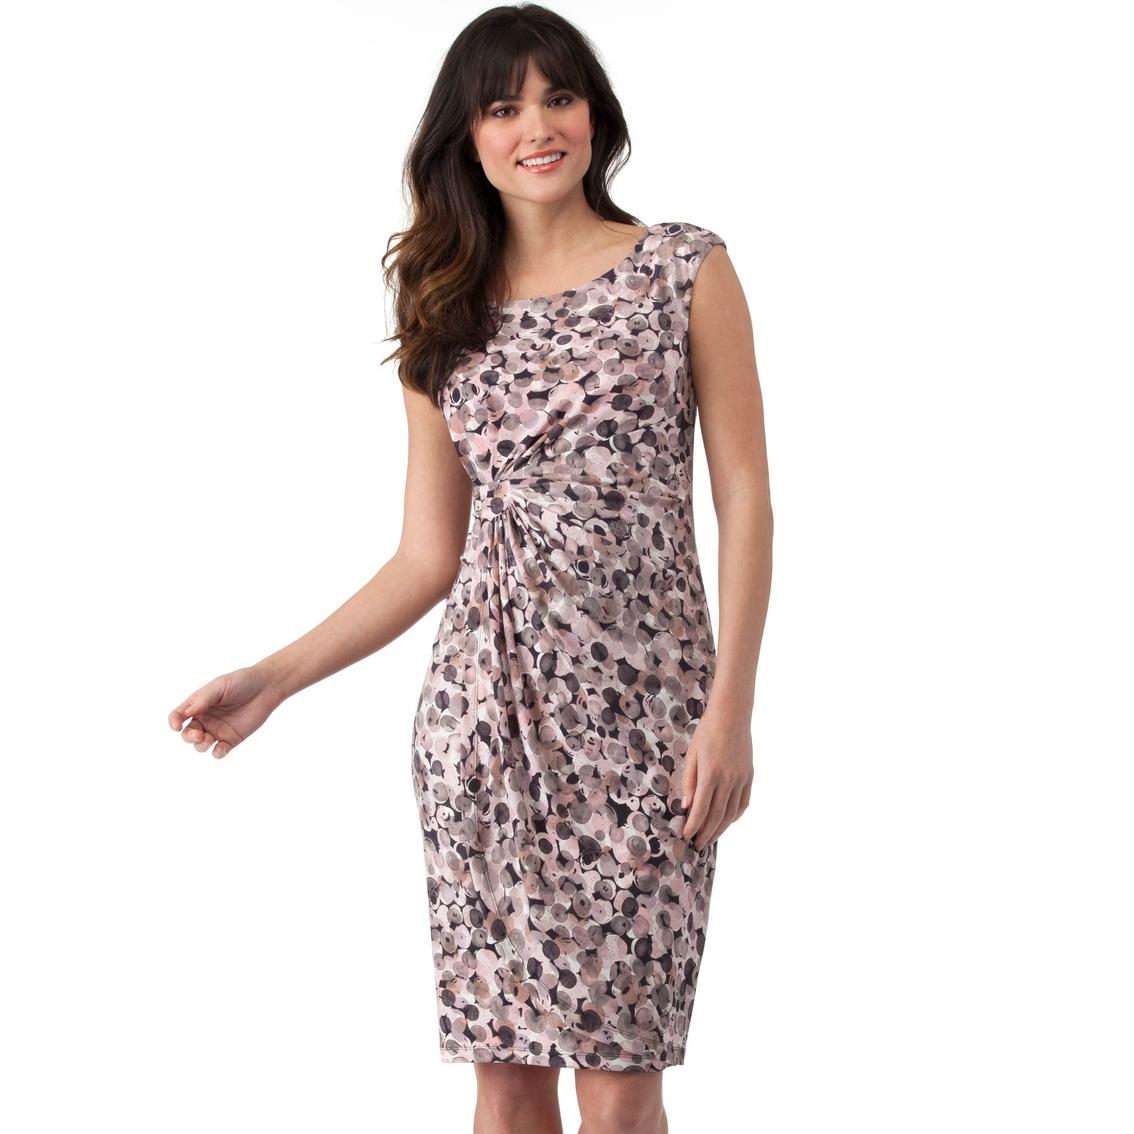 2a26af4b Connected Apparel Bubble Dot Print Sheath Dress | Dresses | Apparel ...